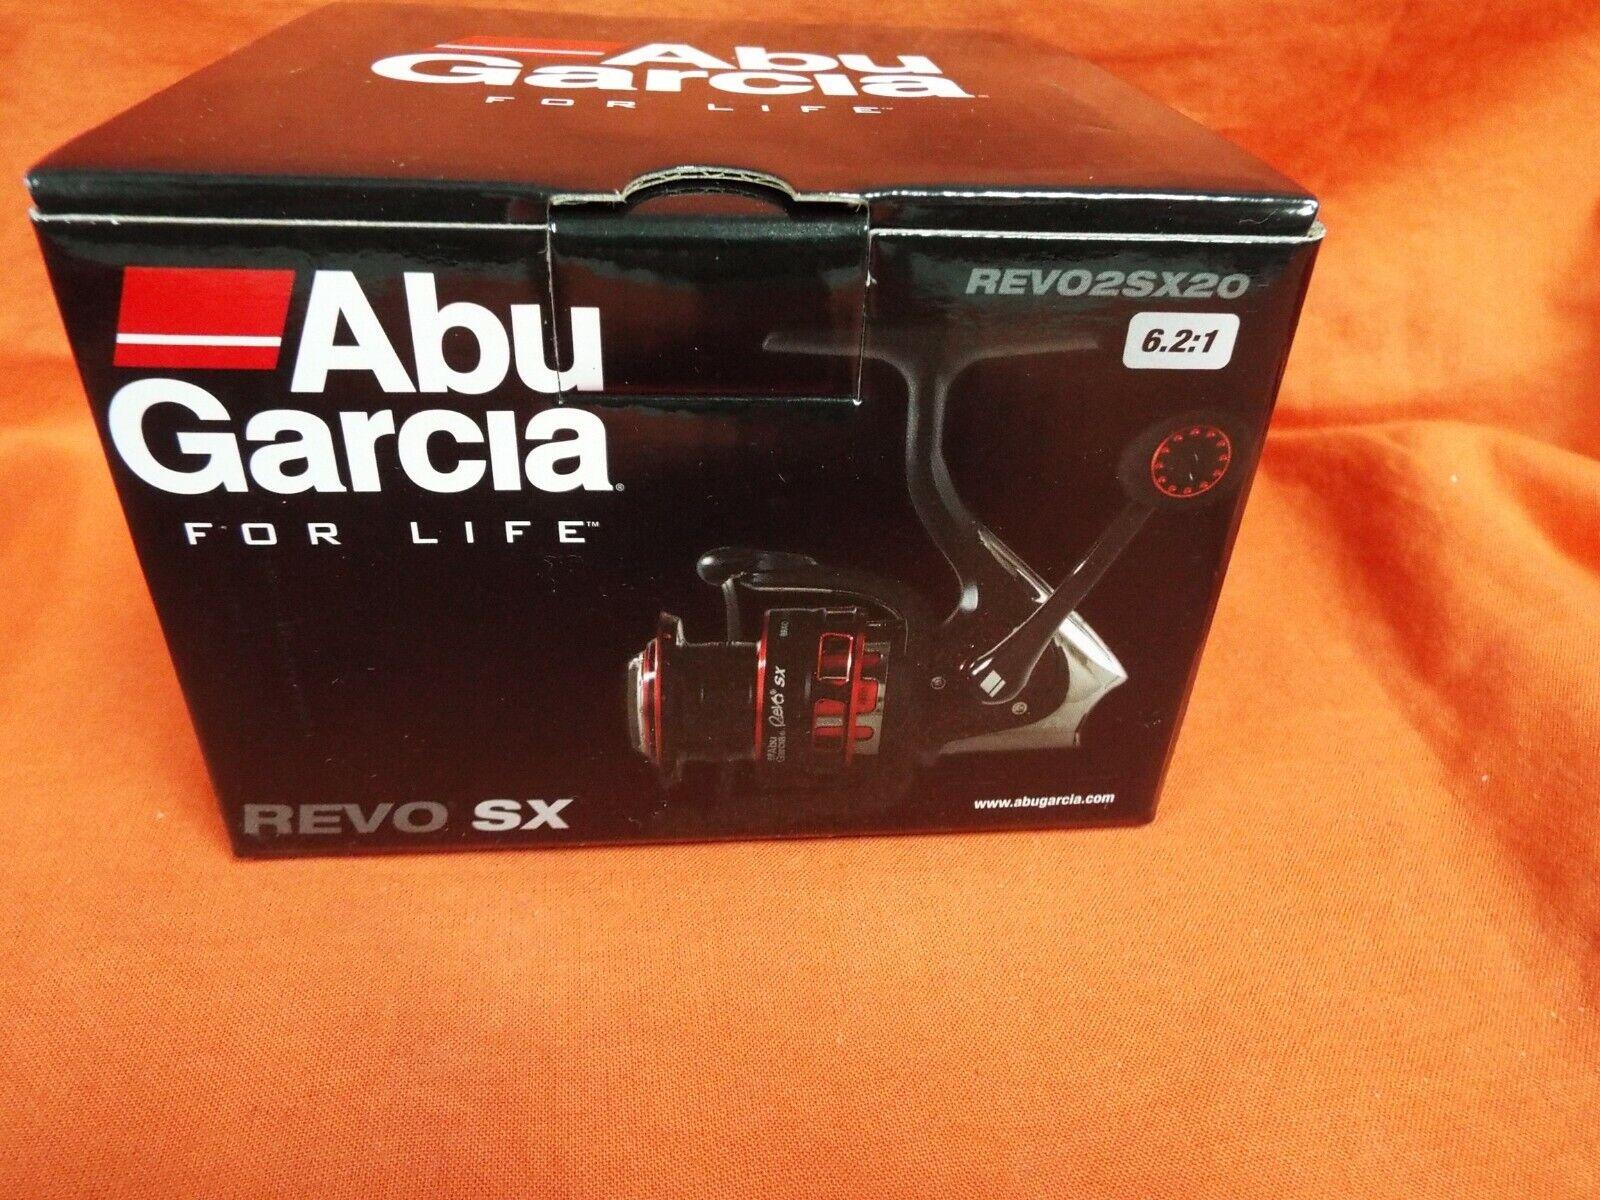 ABU GARCIA REVO SX 20 SPINNING REEL 6.2 1 GR REVO2SX20 1365348